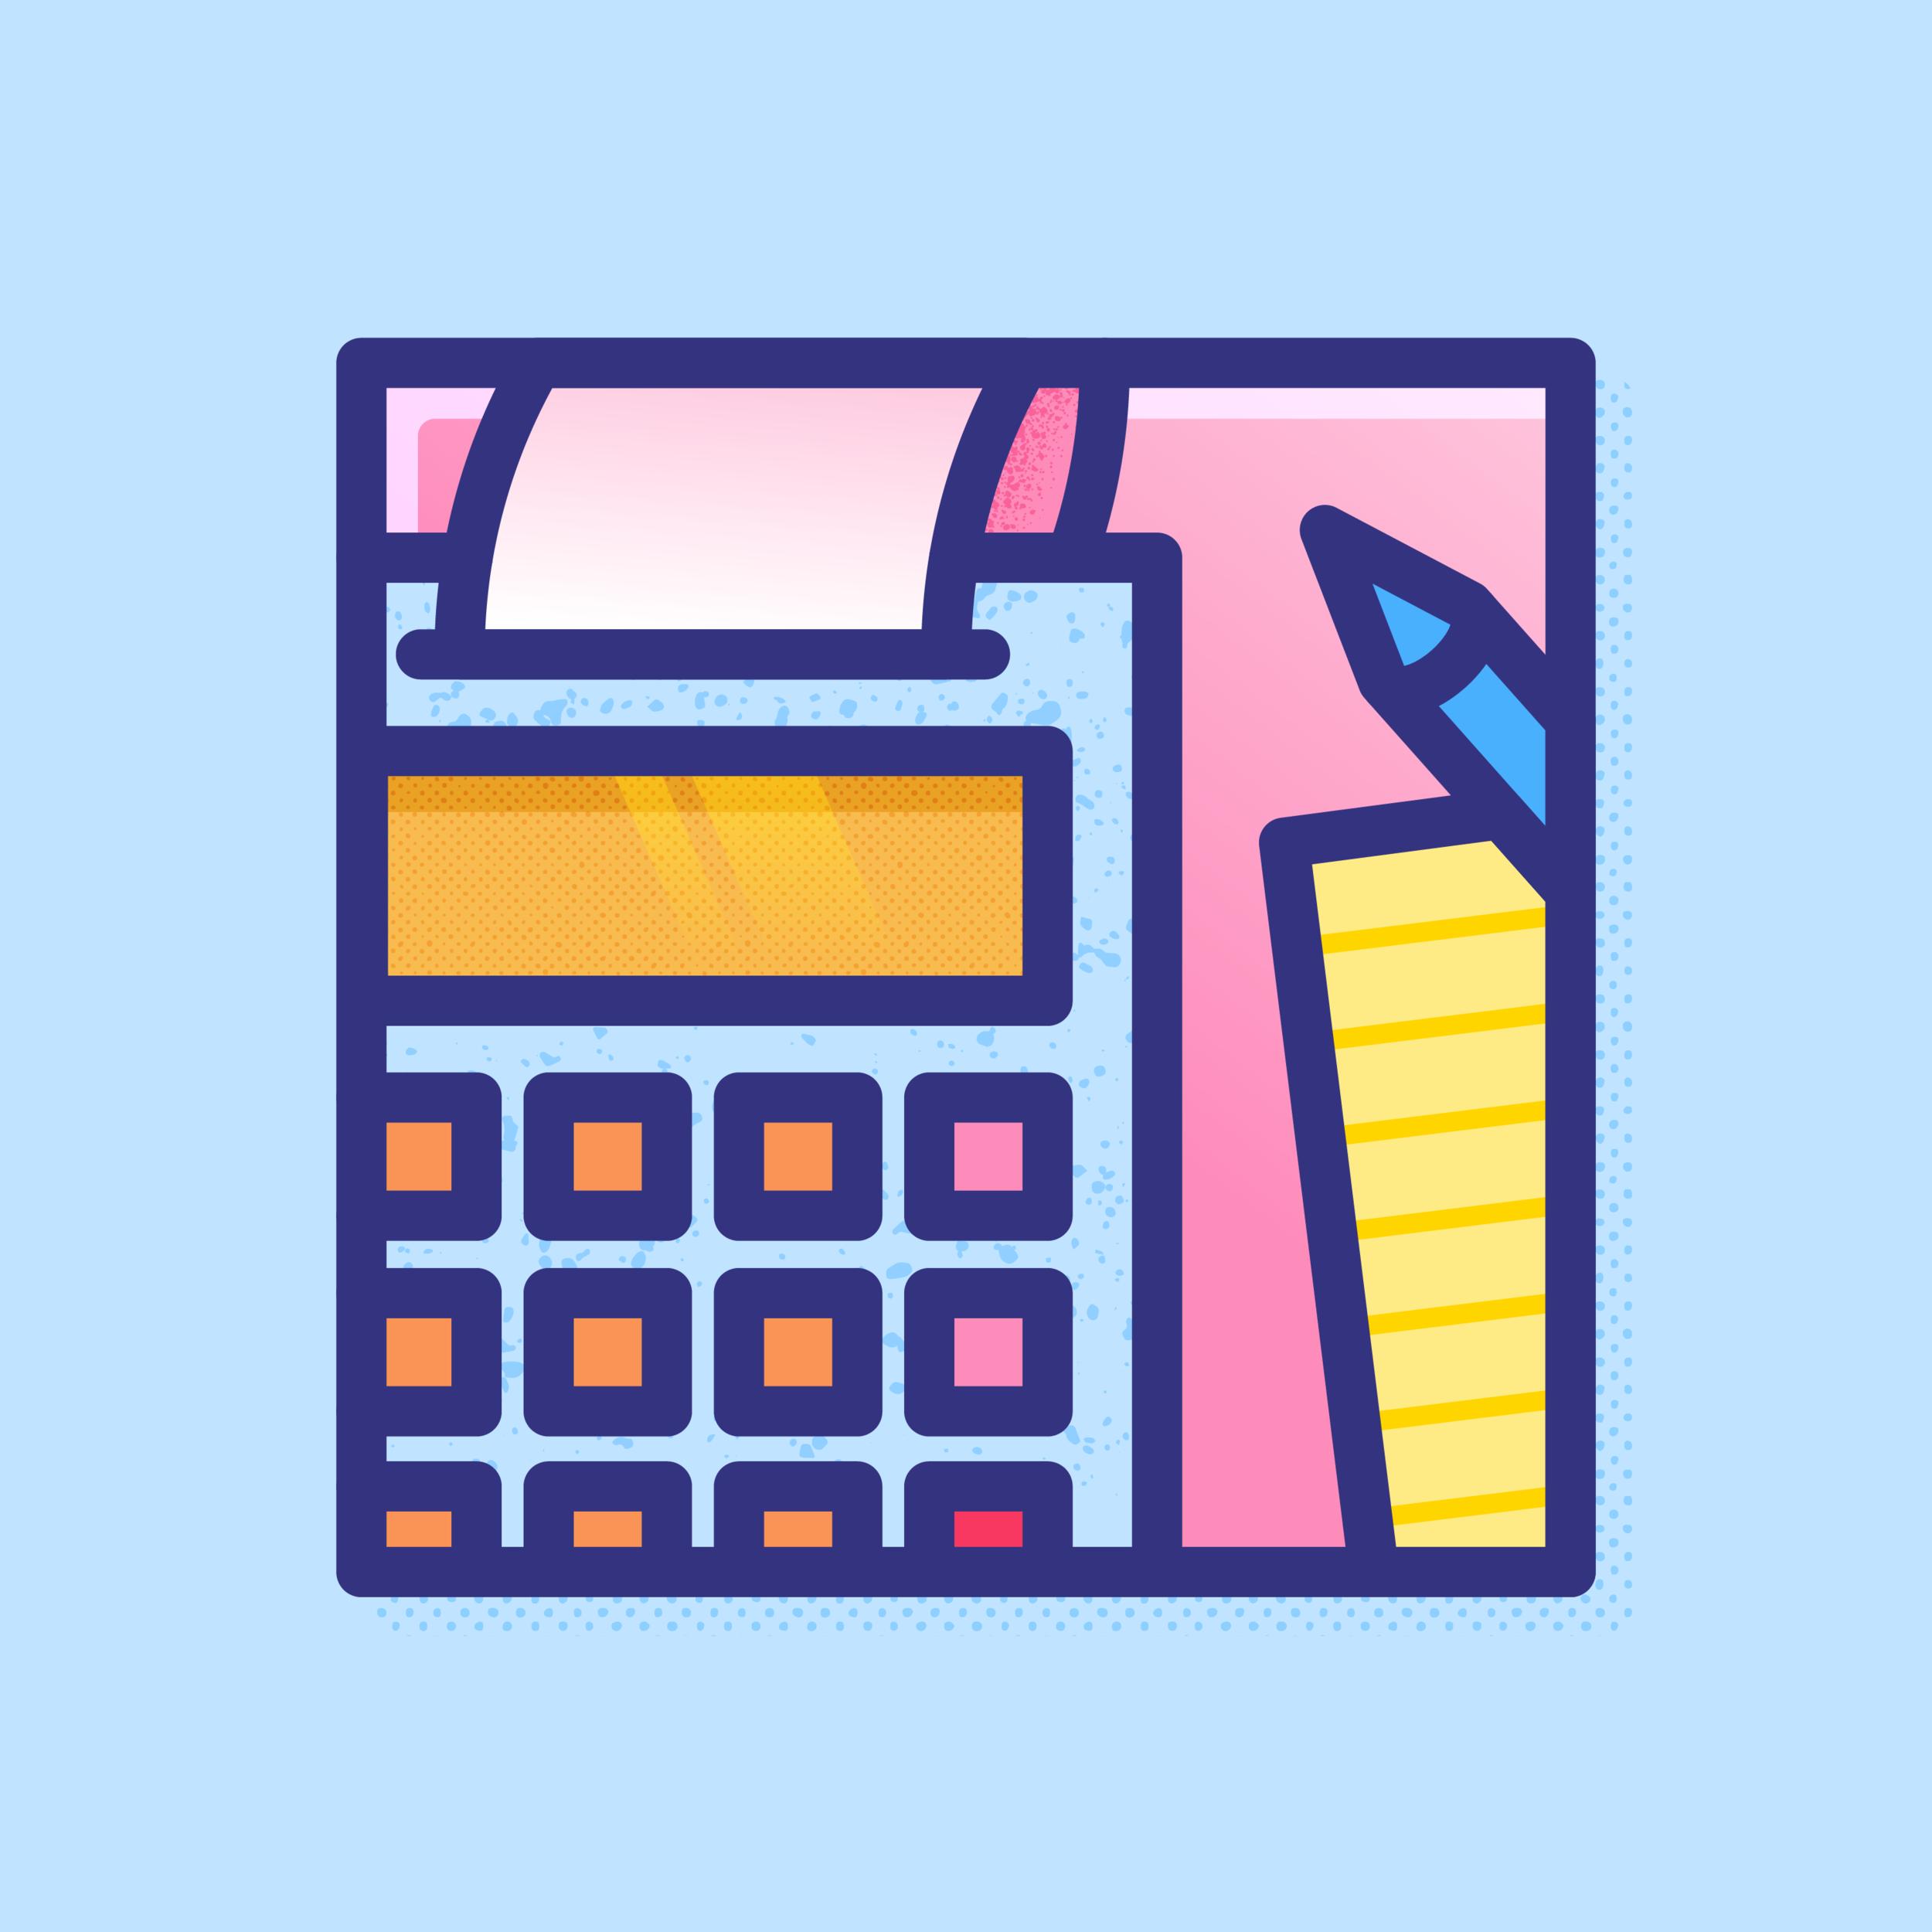 006 calculator IG.png